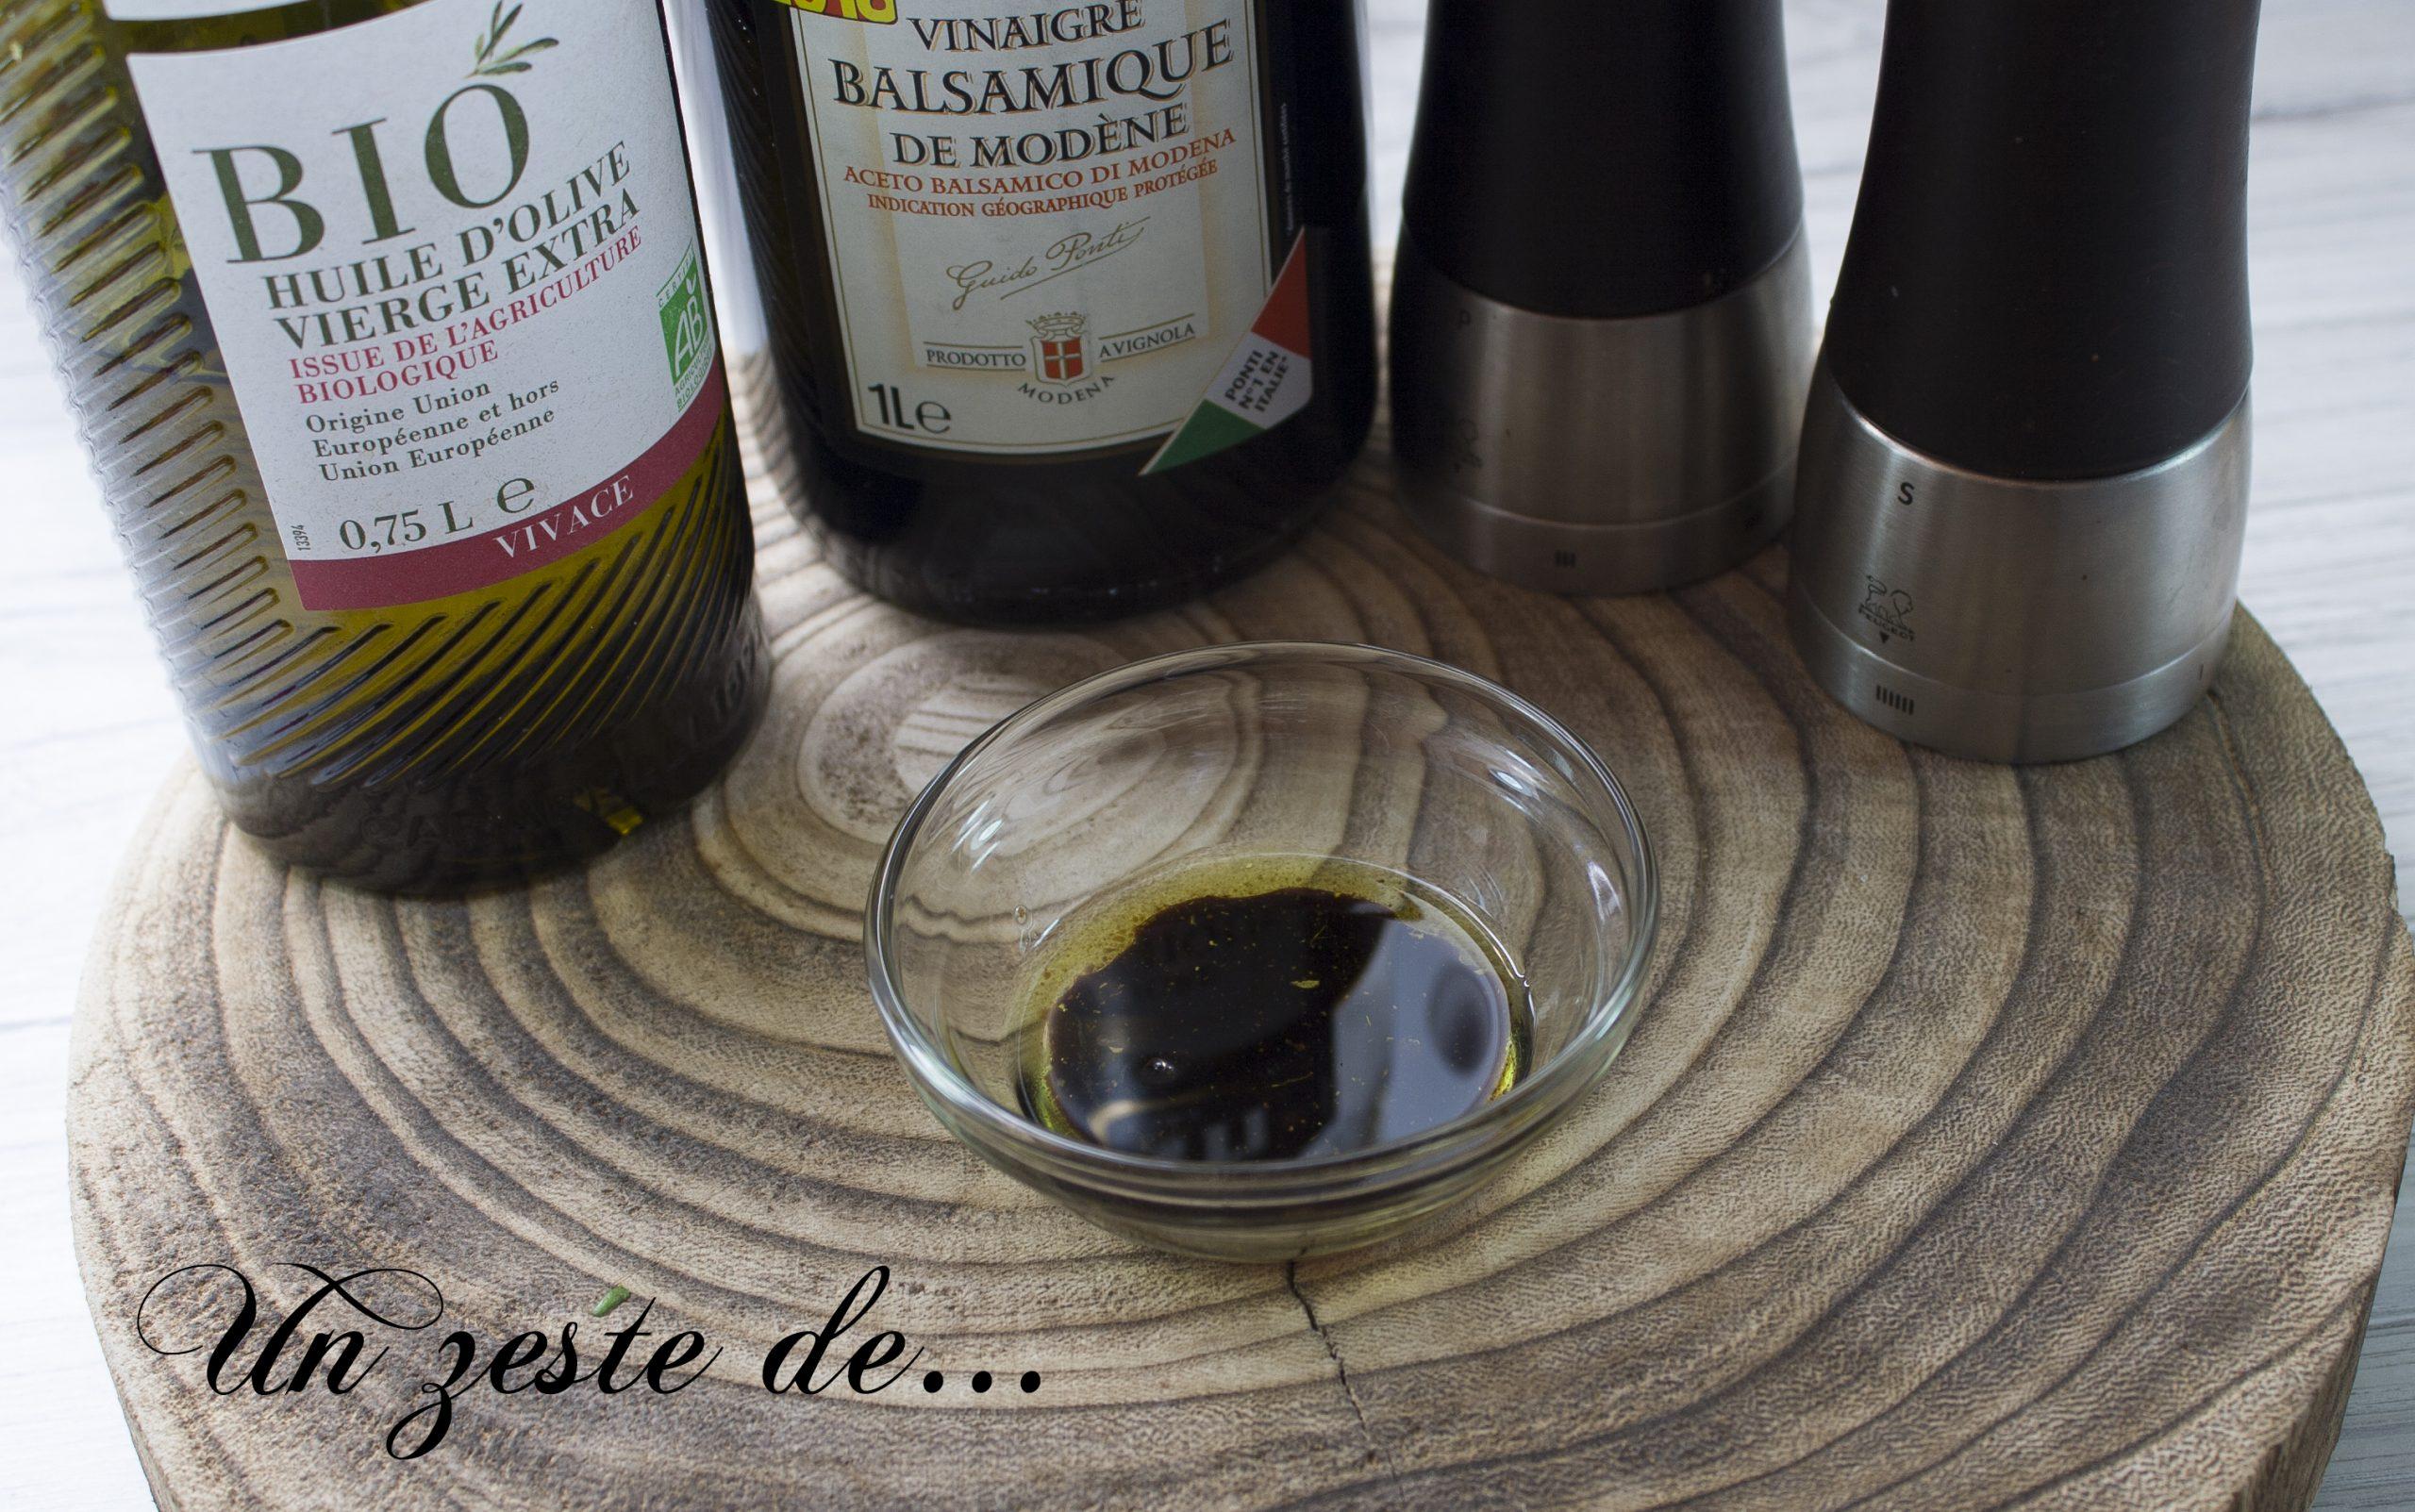 Vinaigrette balsamique